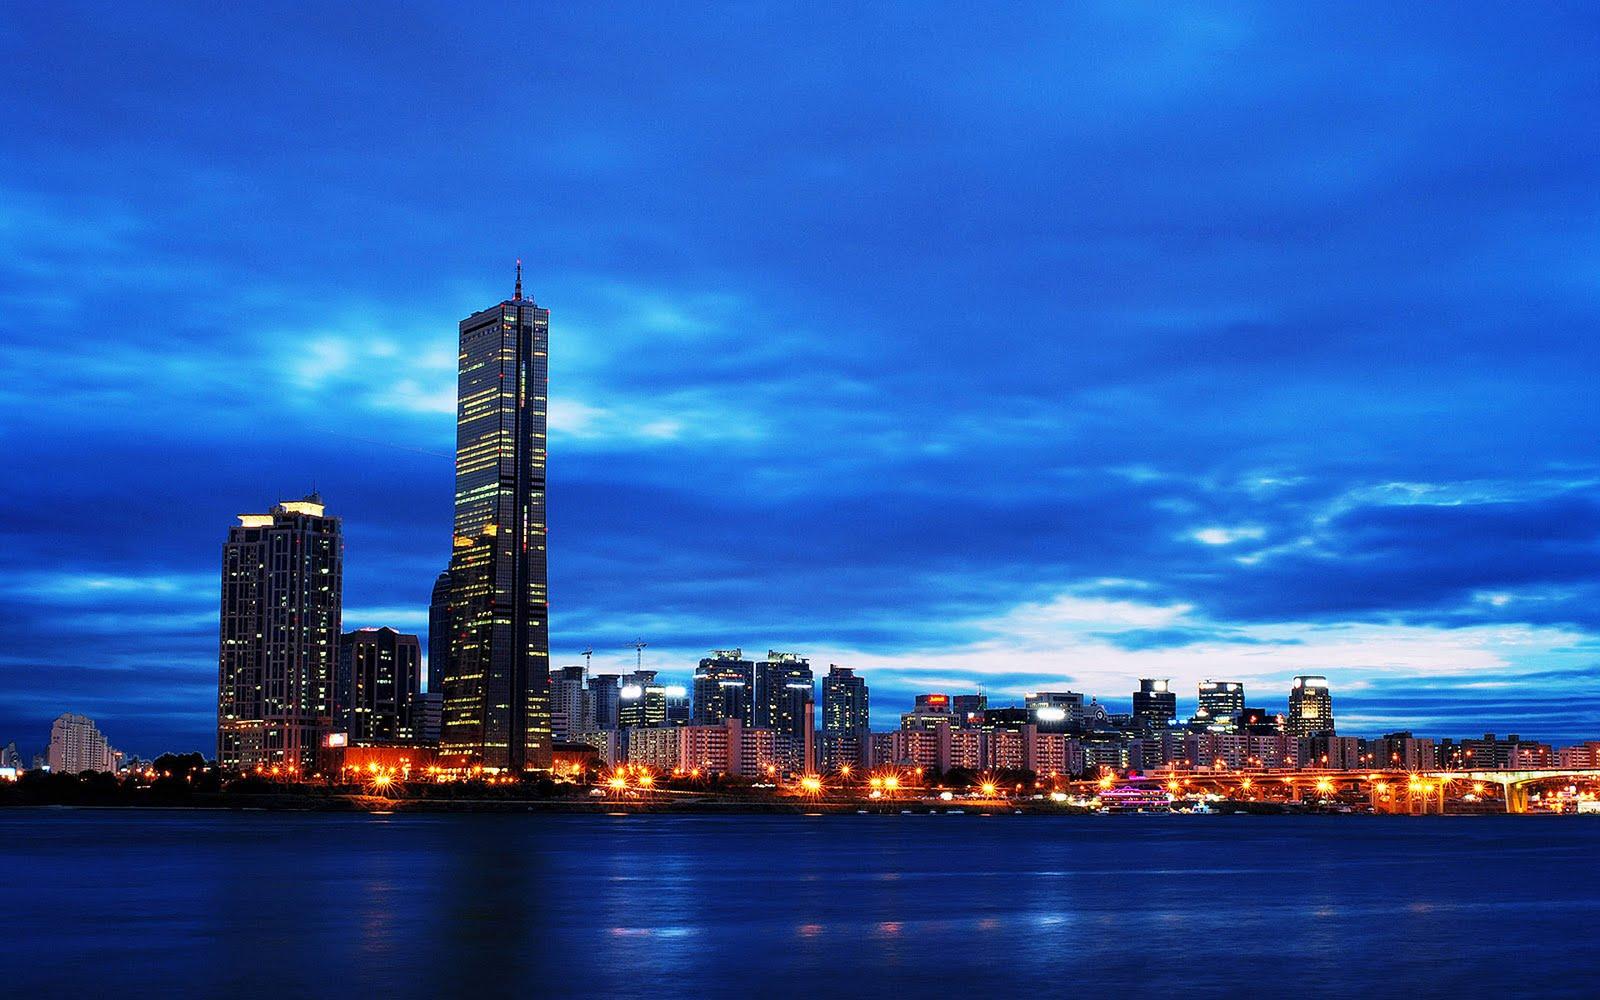 http://3.bp.blogspot.com/-Q7Li0IzEoy4/TfaDFOheyQI/AAAAAAAAEmU/kv2jFx-13Kc/s1600/seoul_south_korea-wide.jpg